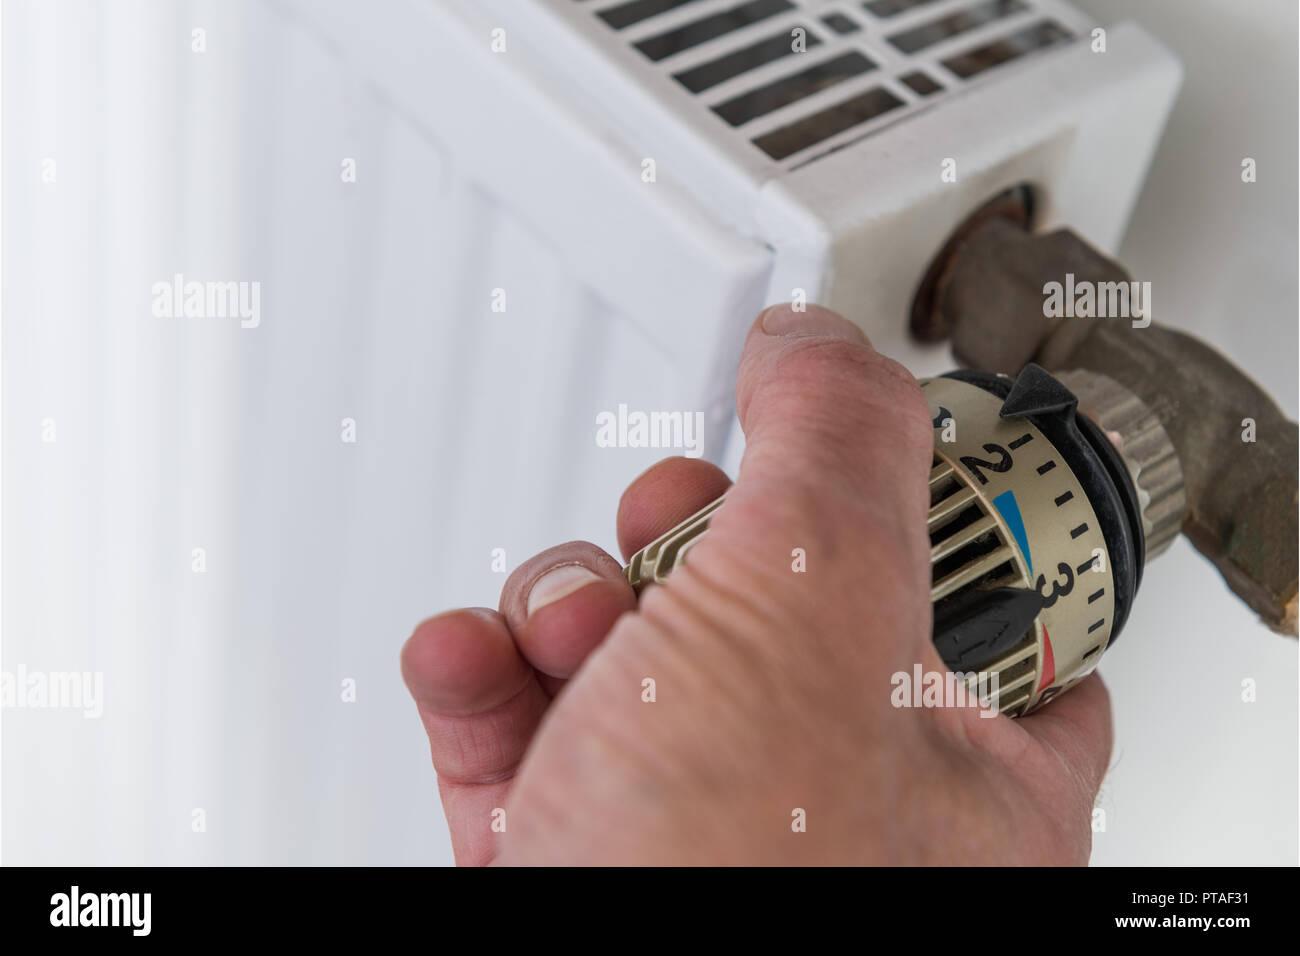 Hand on heater thermostat Stock Photo